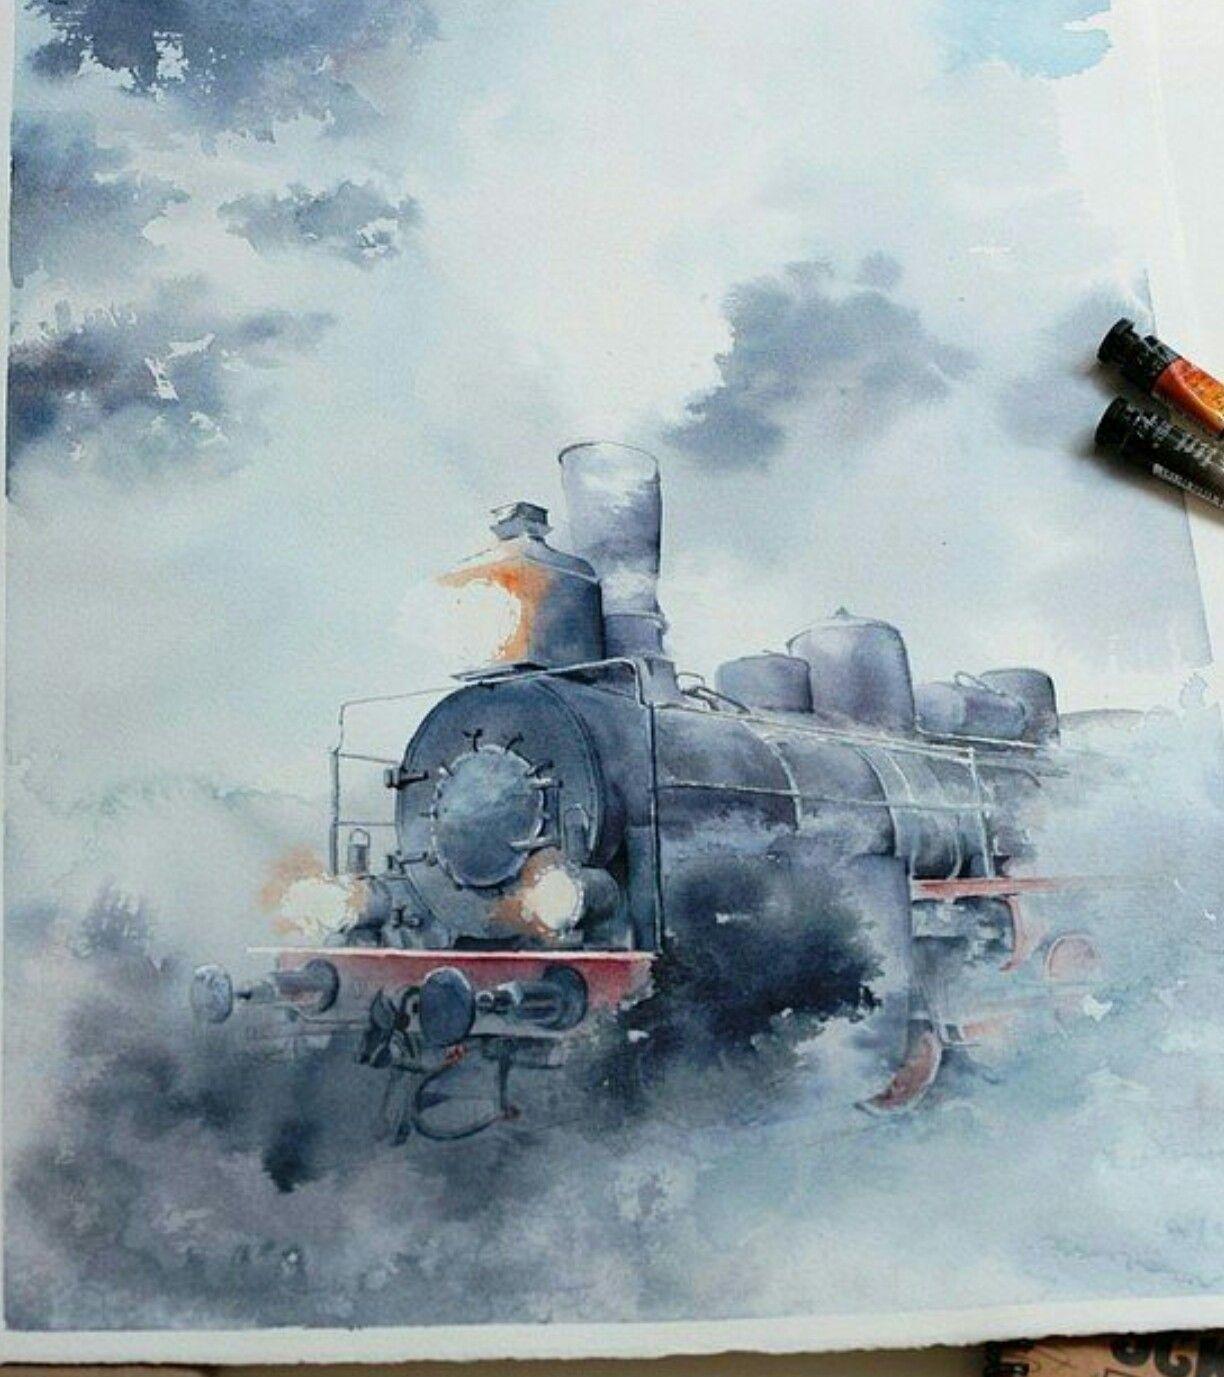 Pin de Maria Jose en People illustration | Dibujos, Acuarela, Tren